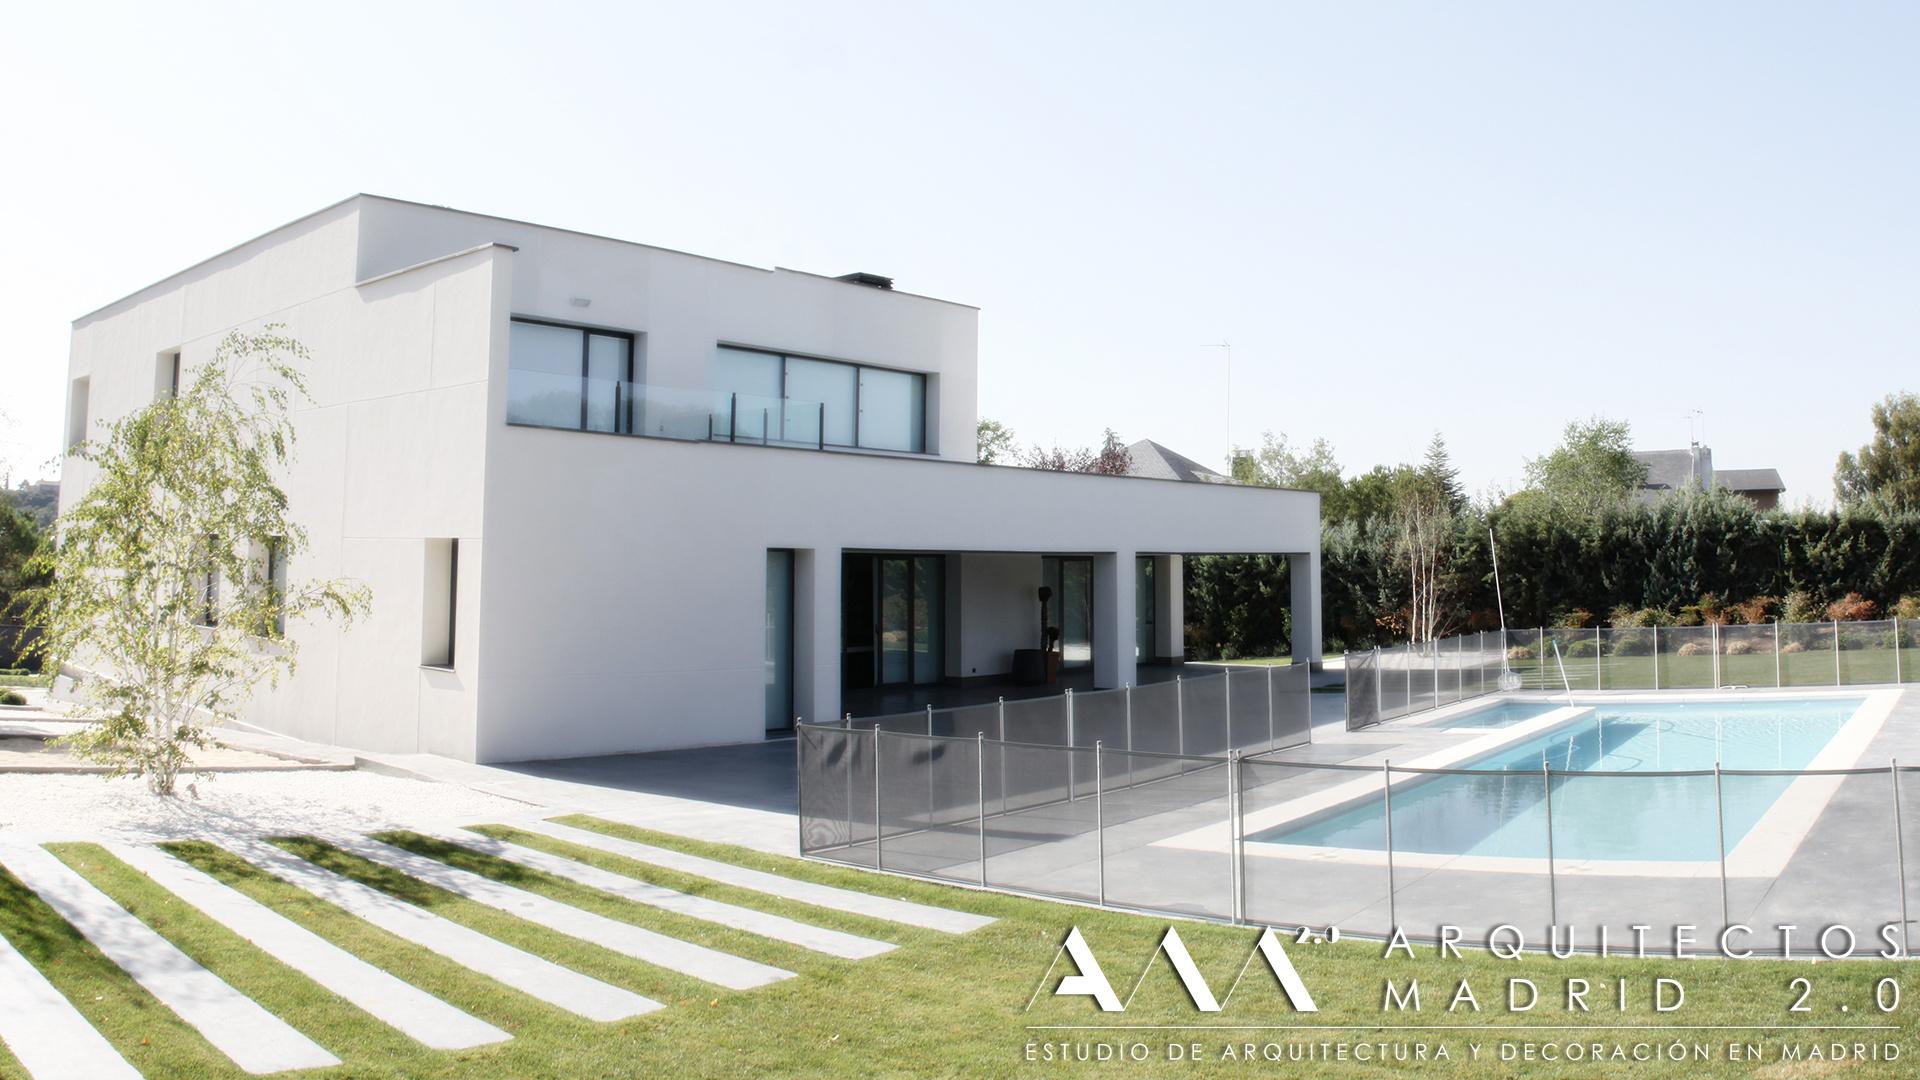 arquitectos-madrid-estudio-arquitectura-en-madrid-proyectos-casas-modernas-18